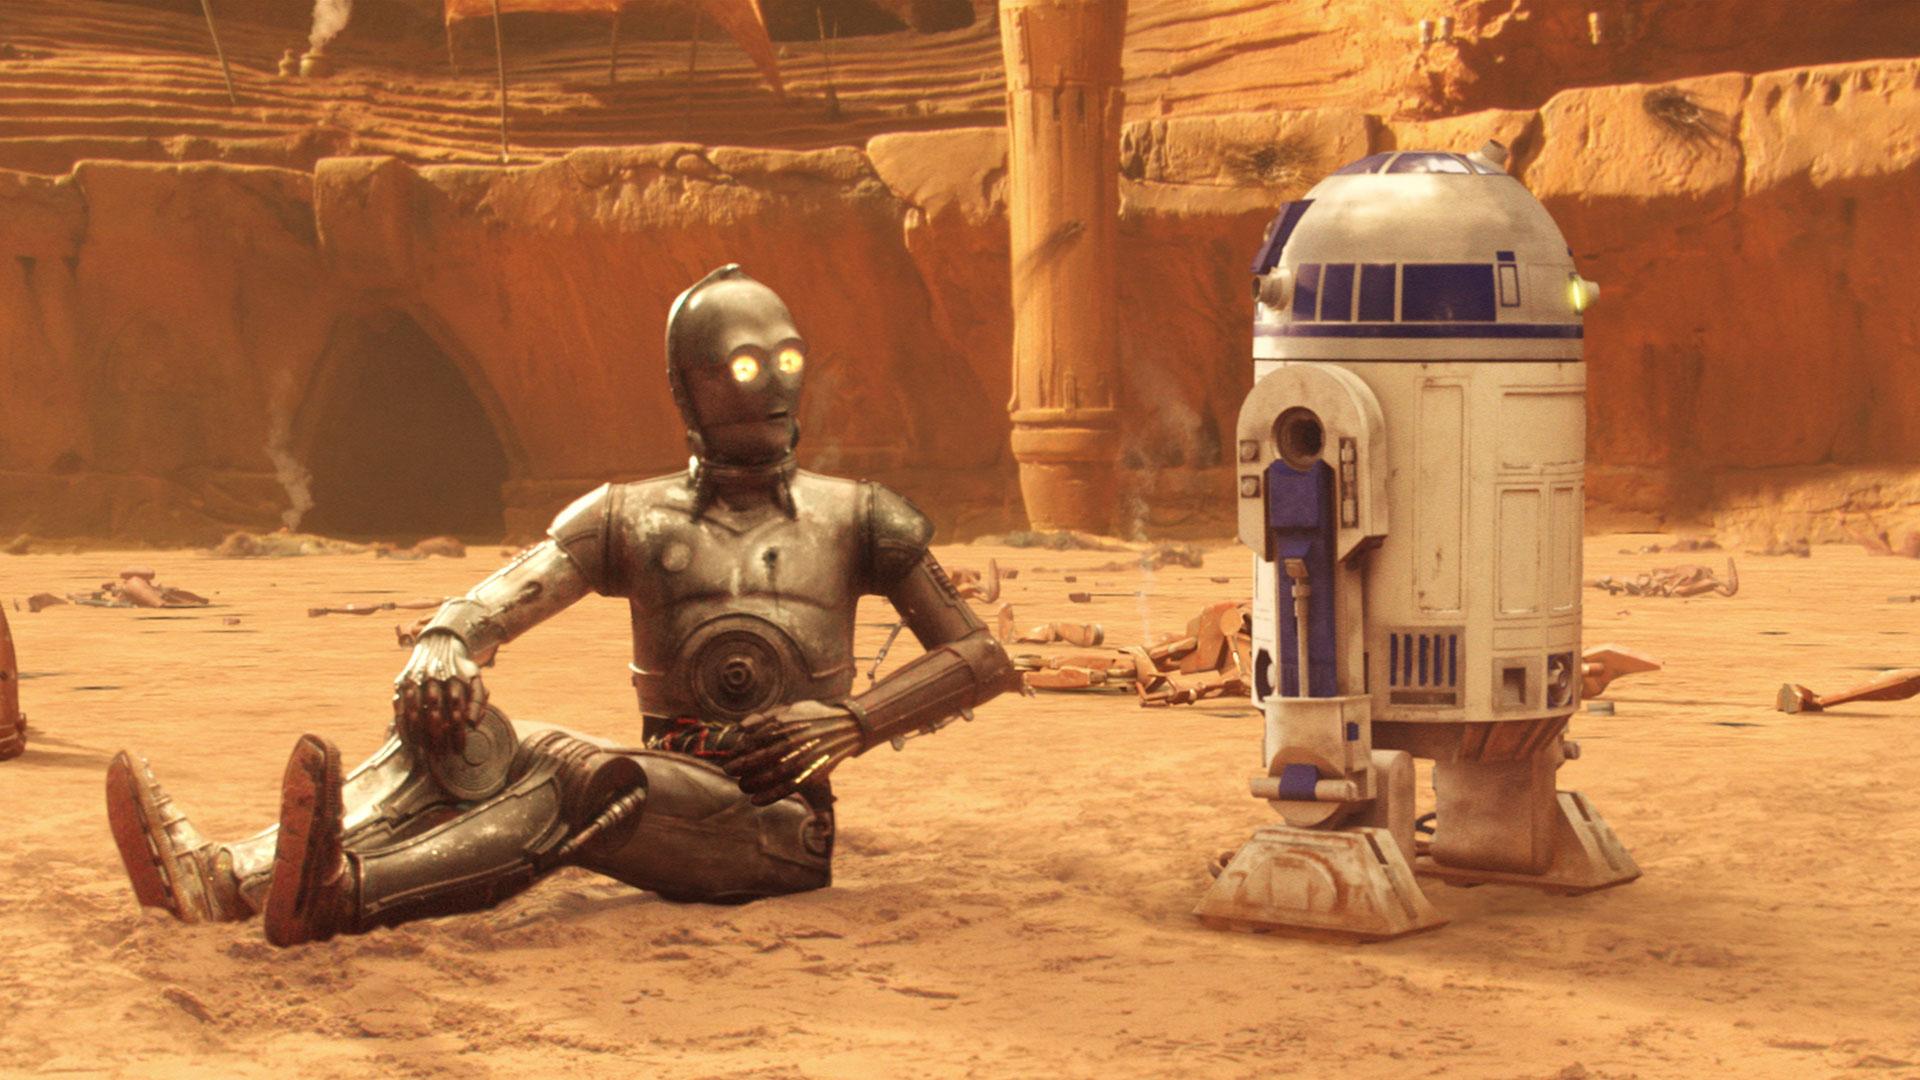 I'm beside myself, R2.